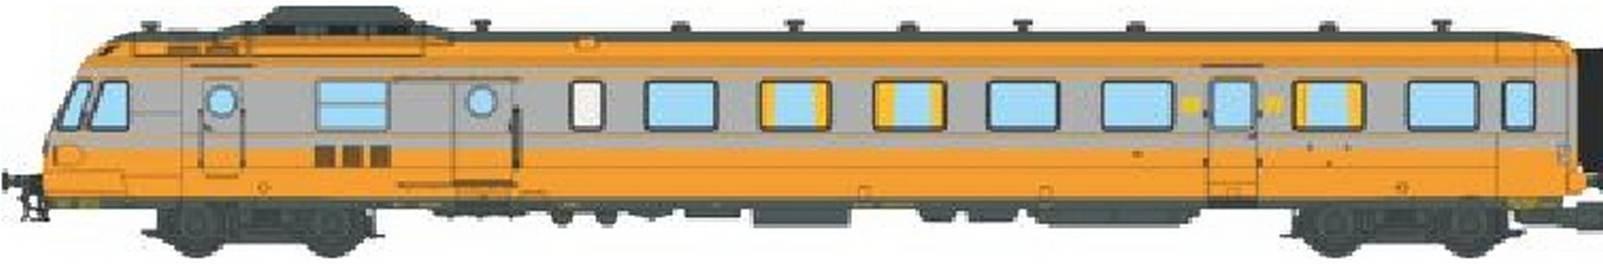 rgp orange 1